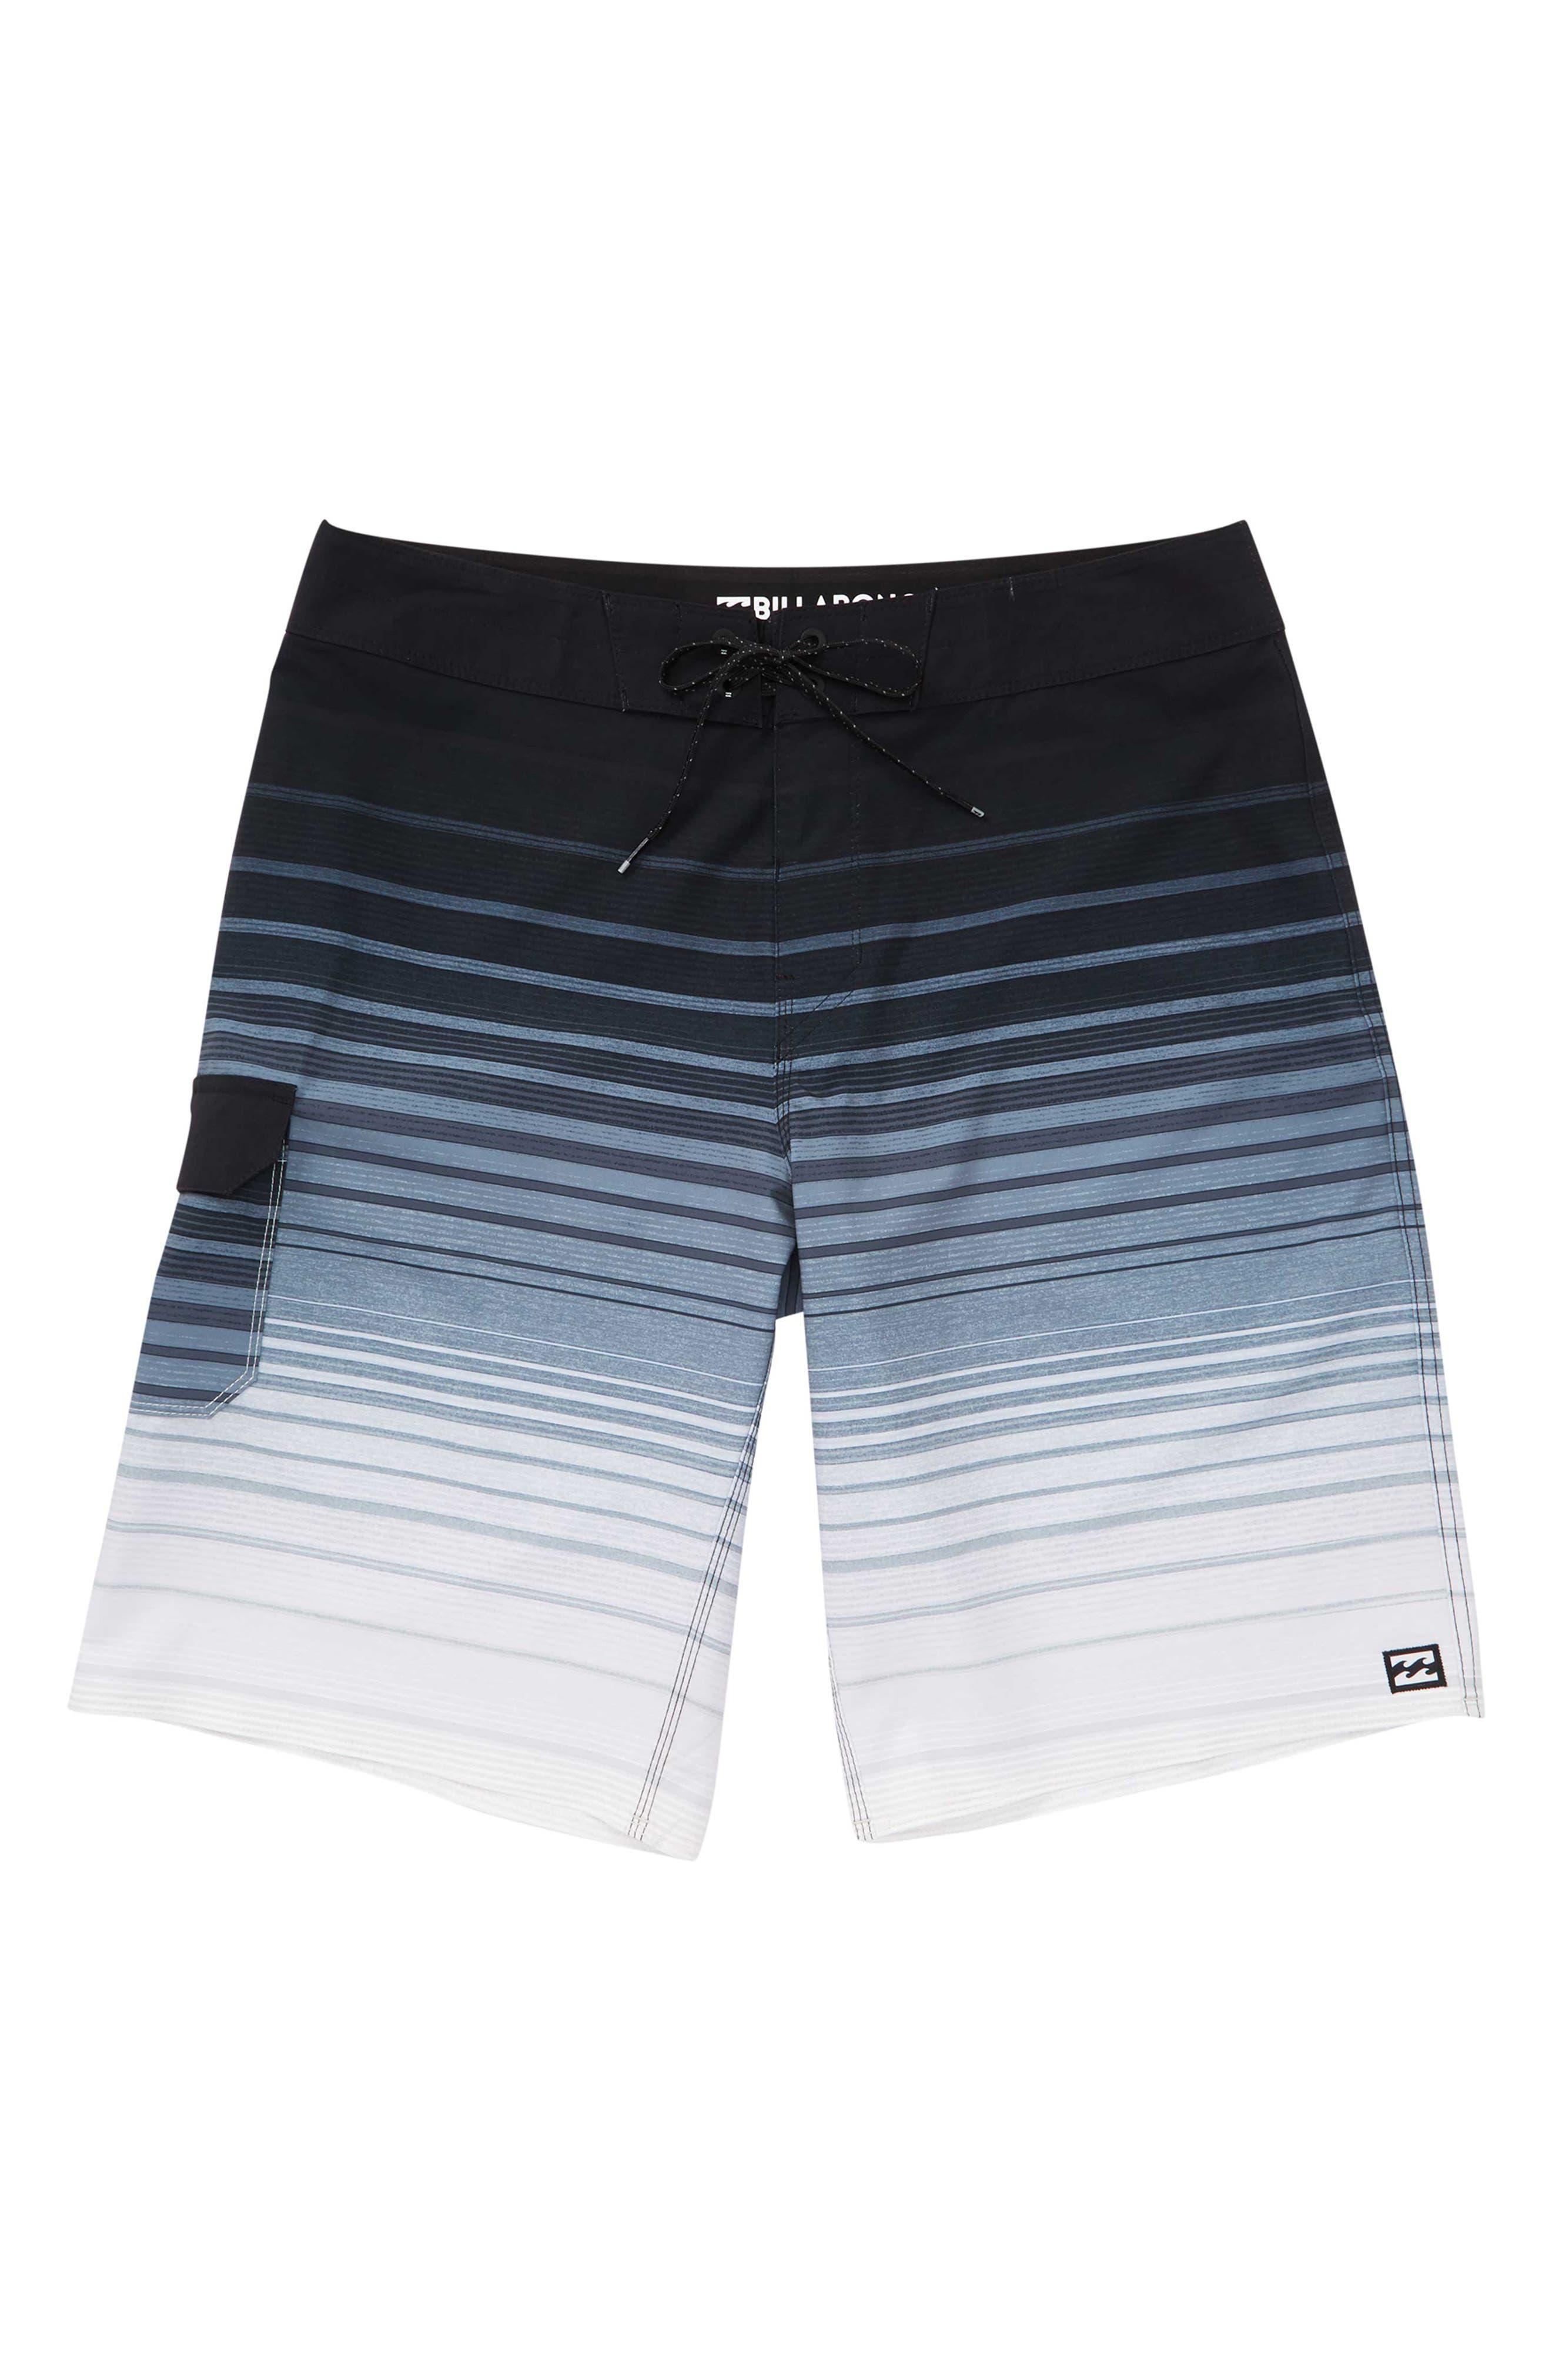 All Day Pro Board Shorts, Main, color, BLACK